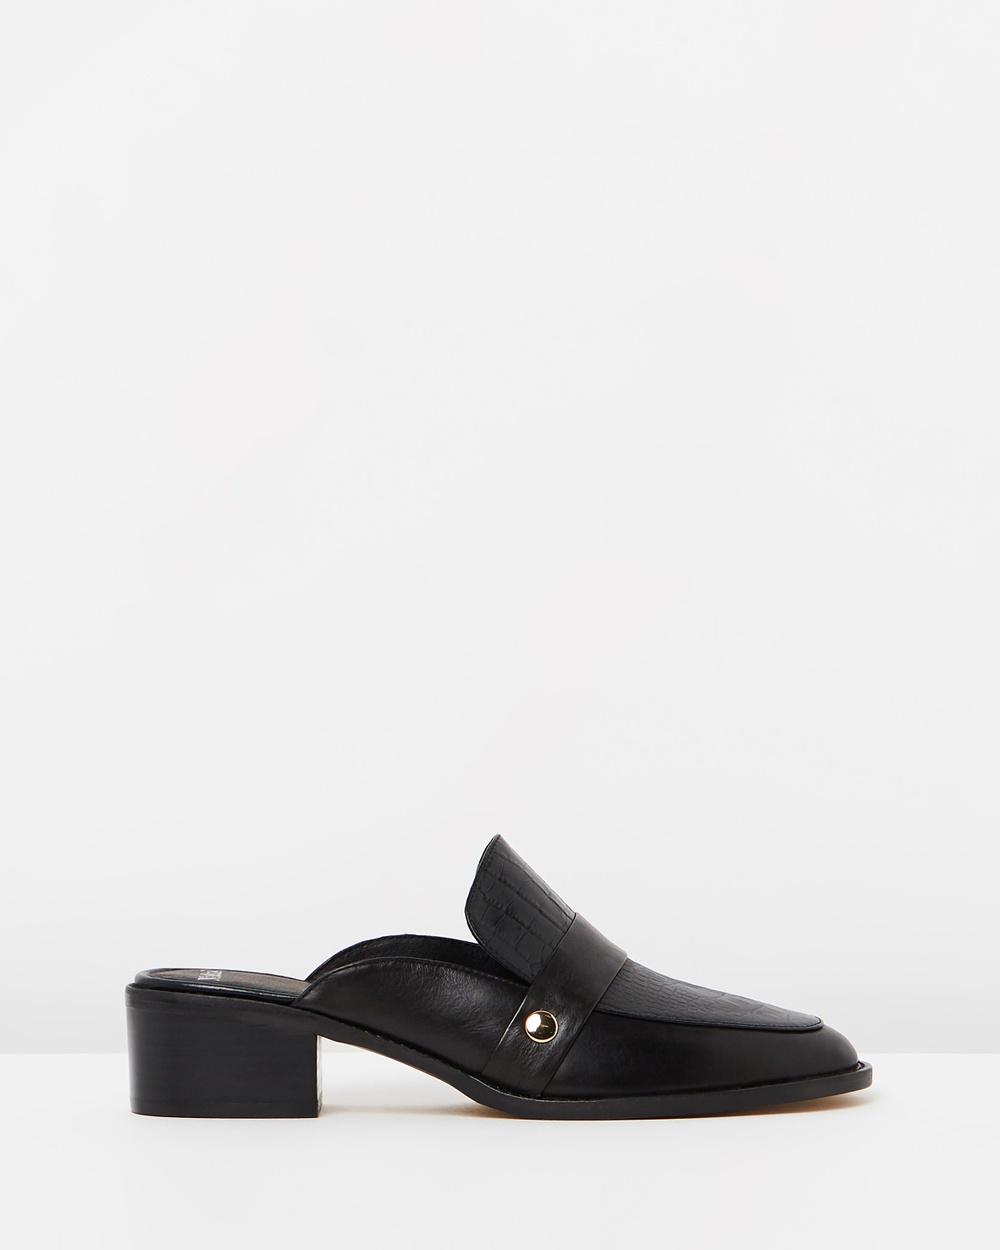 Mollini Argenta Mid-low heels Black Leather Croc Argenta